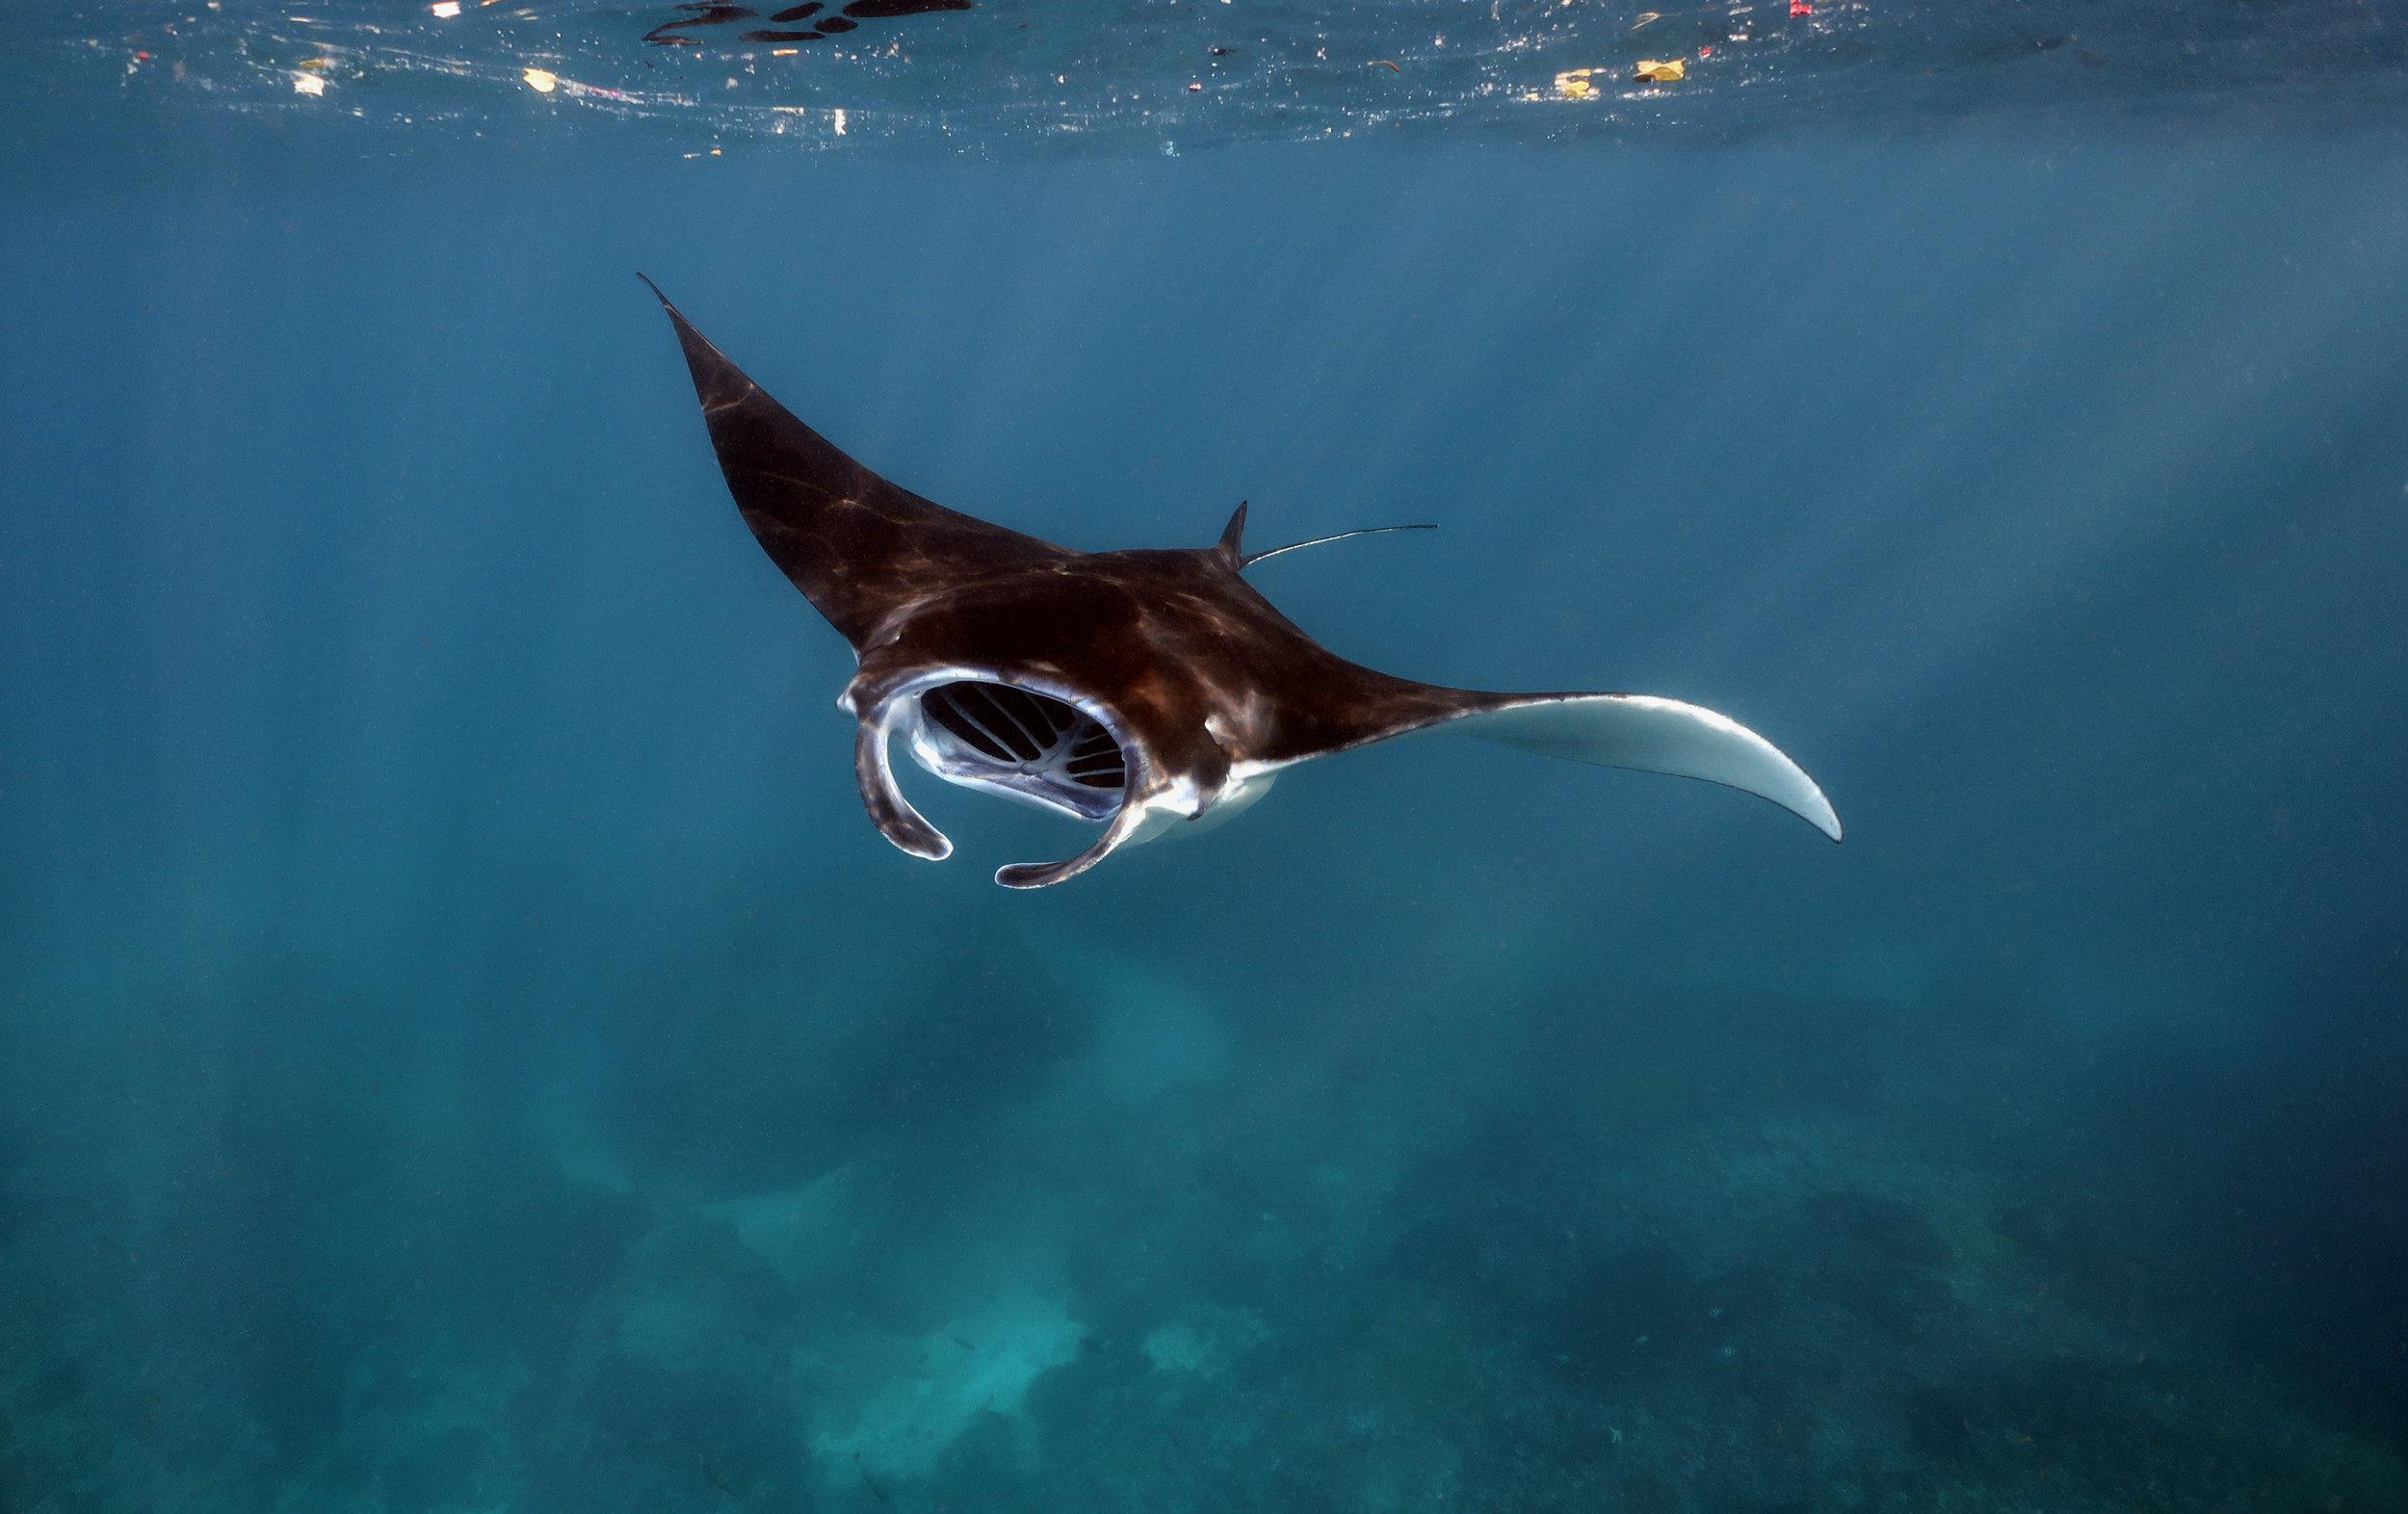 manta fly-by, nusa penida CREDIT: Anett Szaszi / coral reef image bank